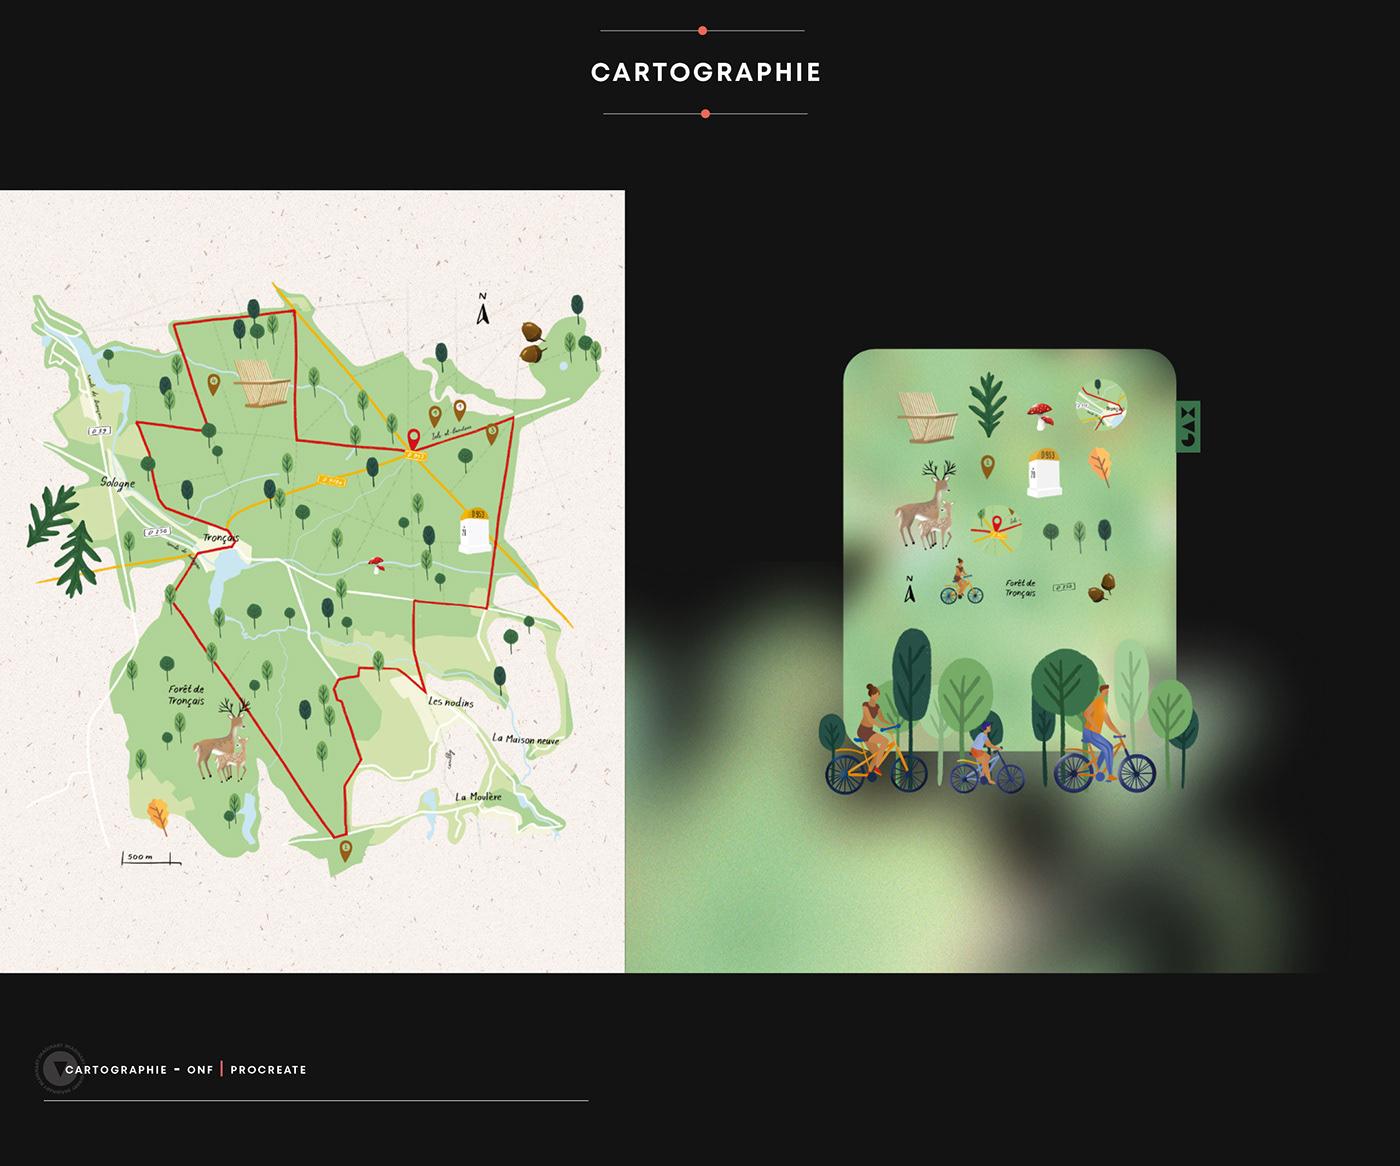 Advertising  Cartographie flower illustrafolio ILLUSTRATION  Illustrator portrait Procreate Typographie